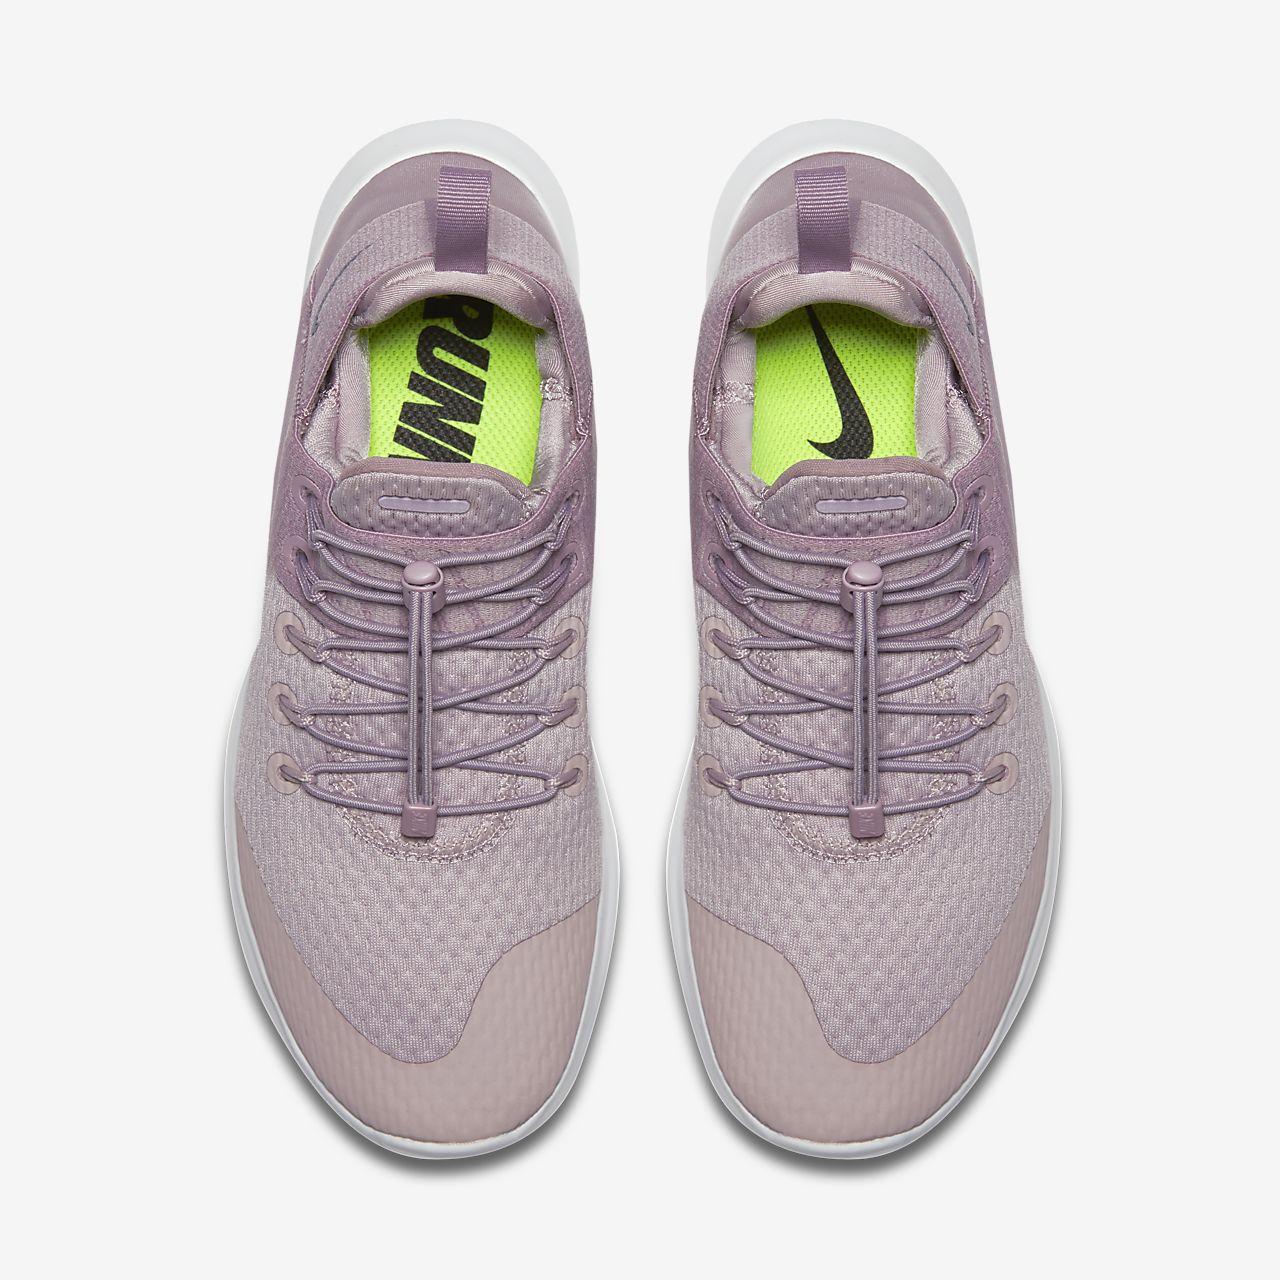 Wmns Nike Libre Rn Cmtr 2017 - Chaussures Pour femmes / Violet Nike Aanyhy6